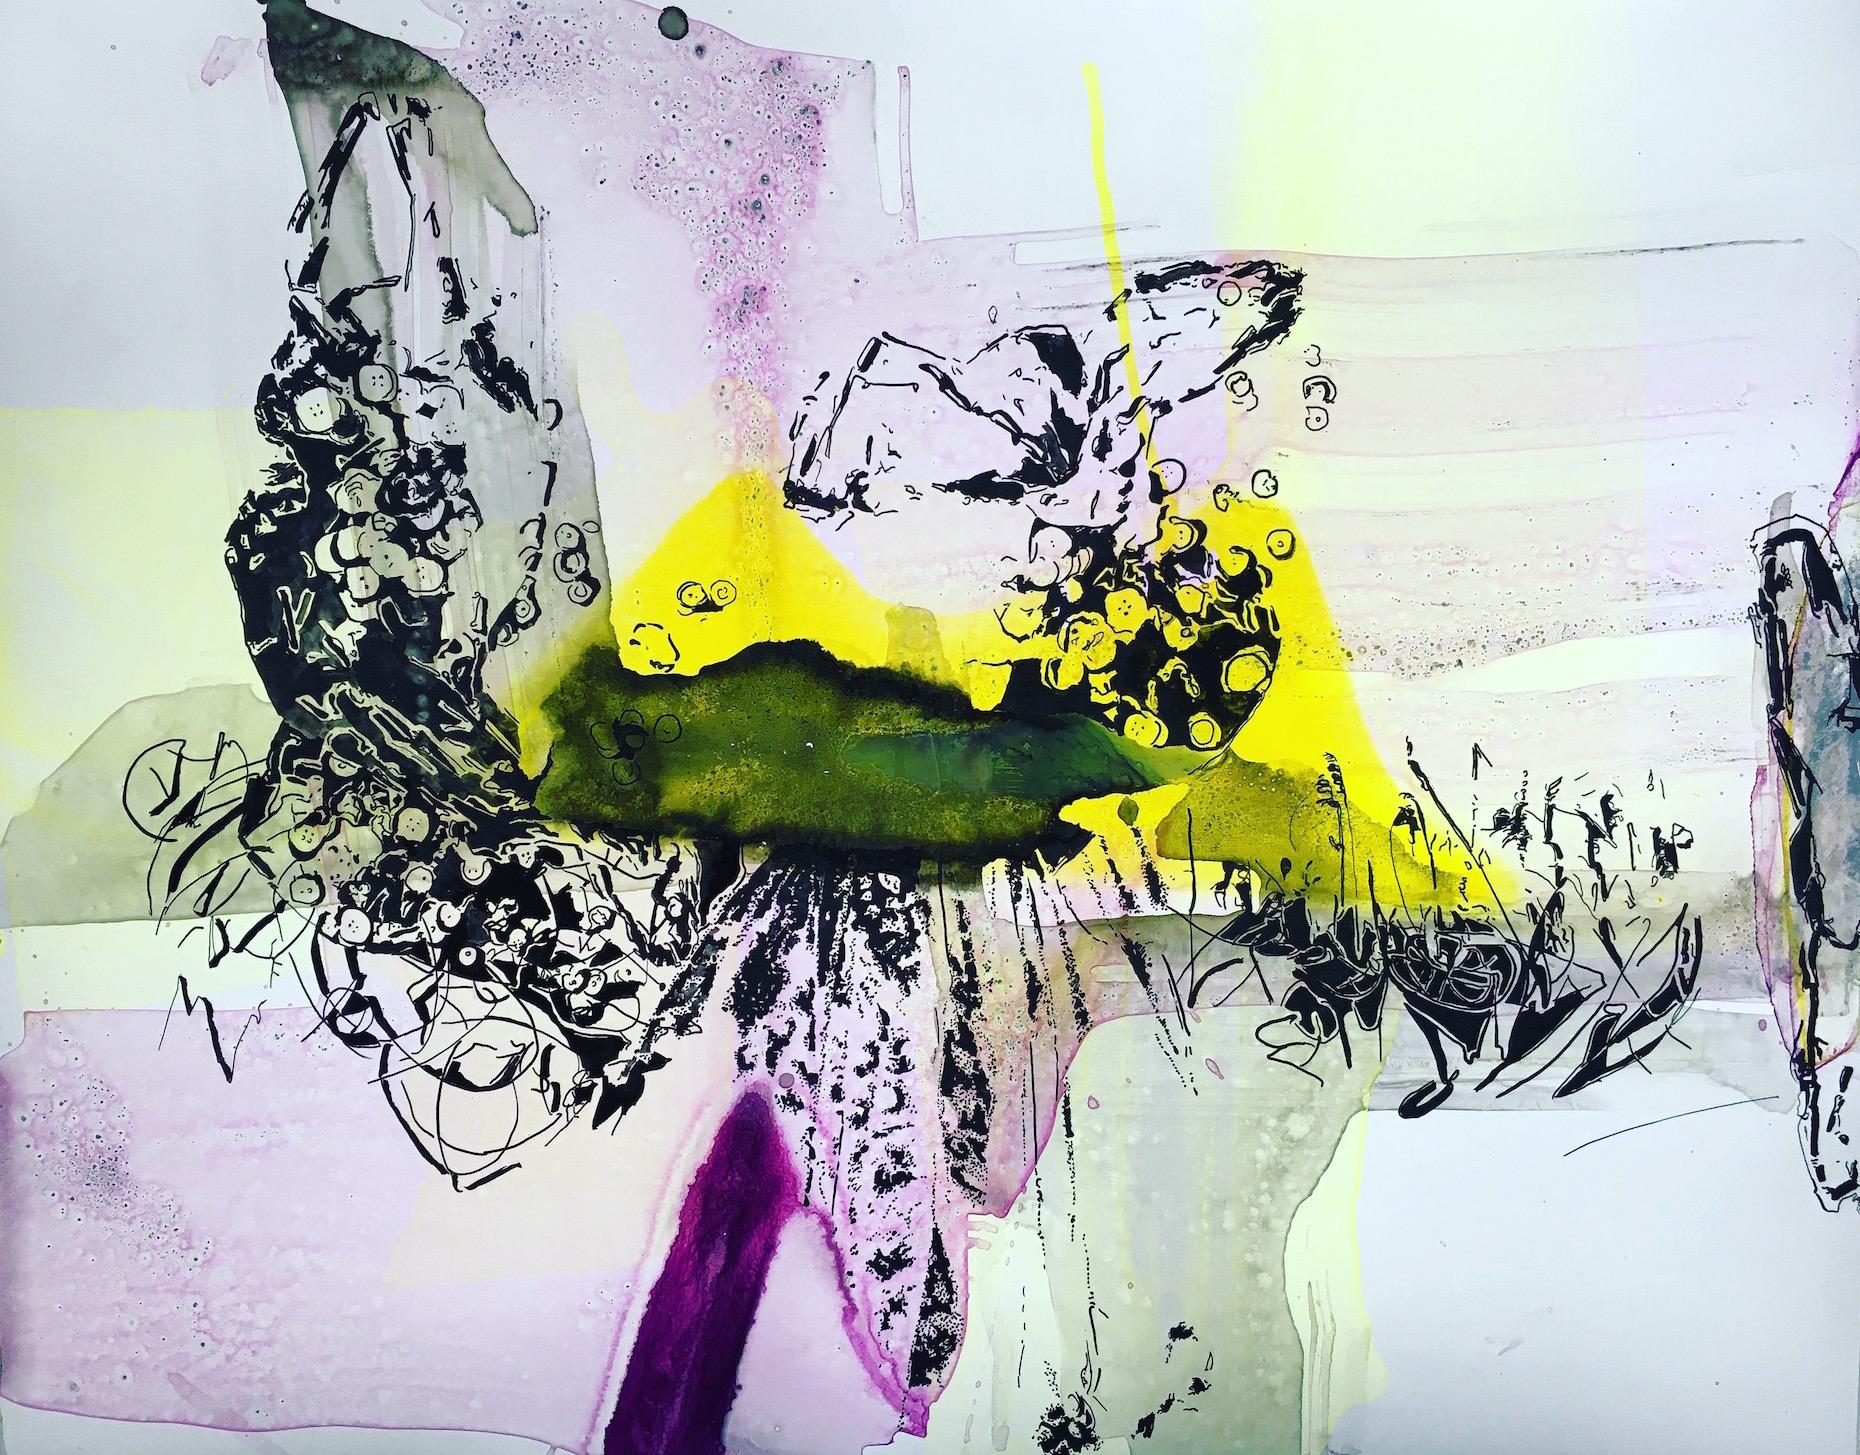 Joana Fischer, Plastic landscape I - Plastiklandschaft I, 2017, ink on yupo, 20 x 26 inches